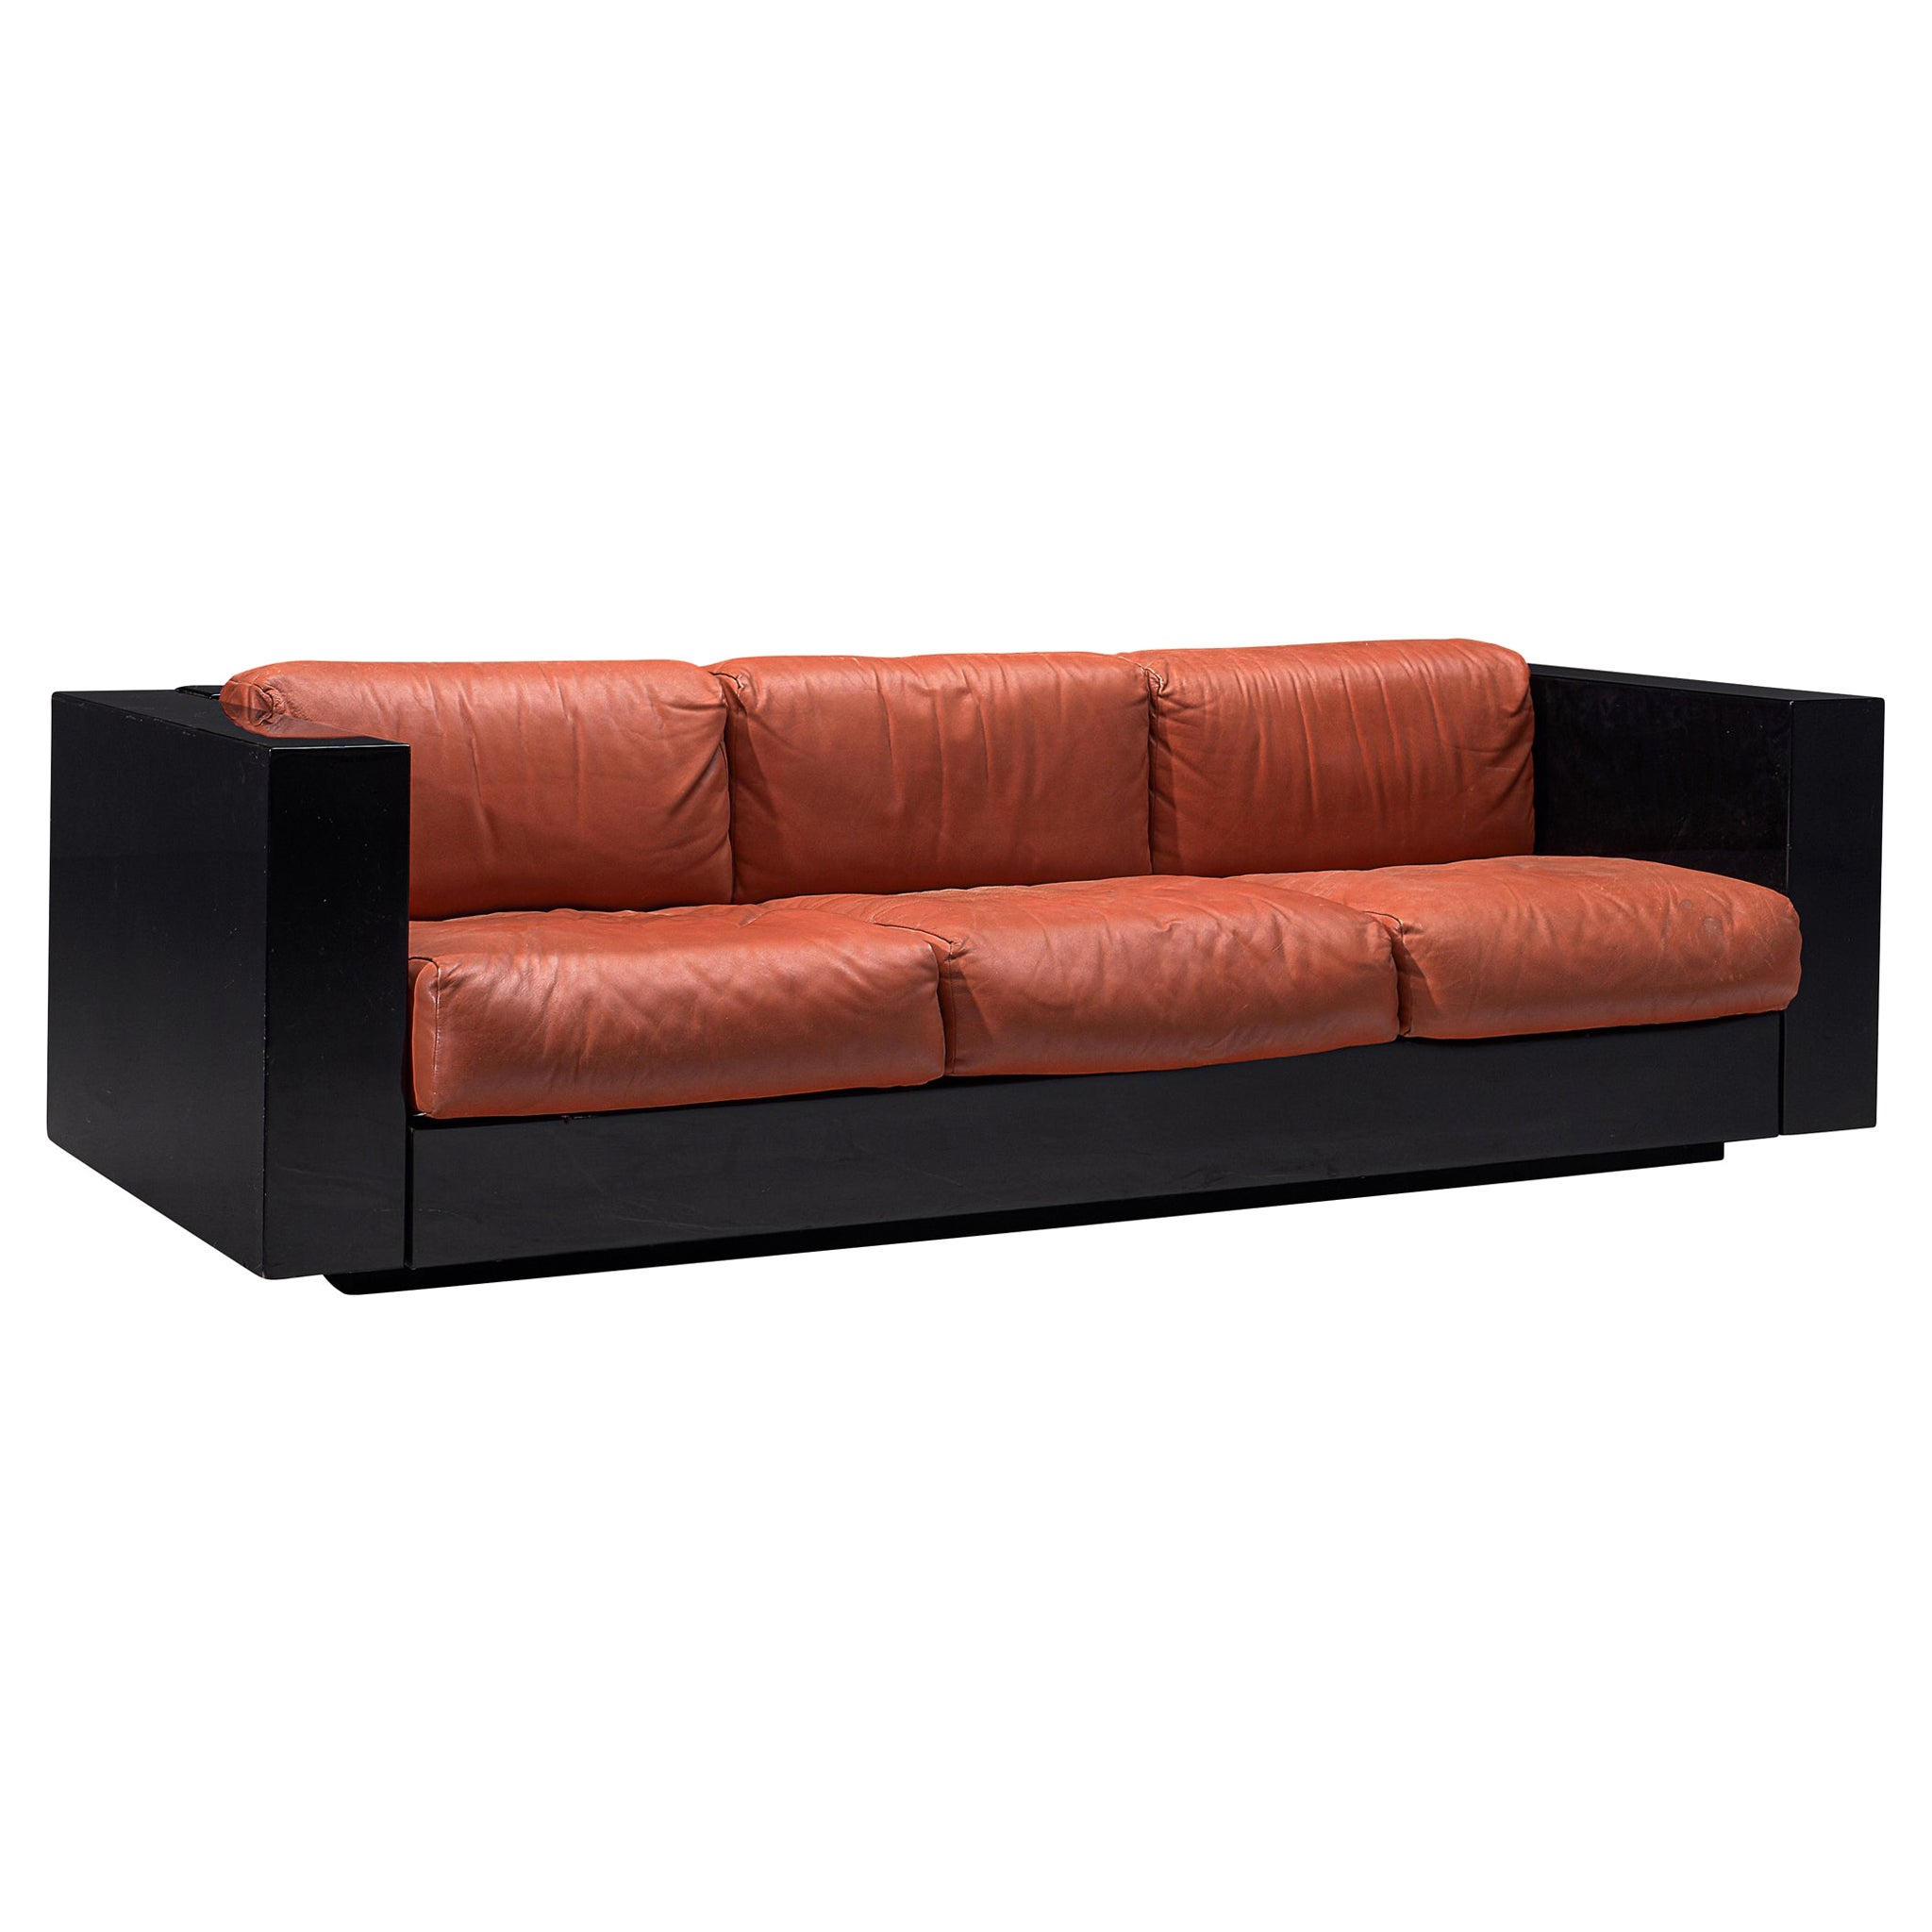 Vignelli Saratoga Large Black Sofa with Red Leather